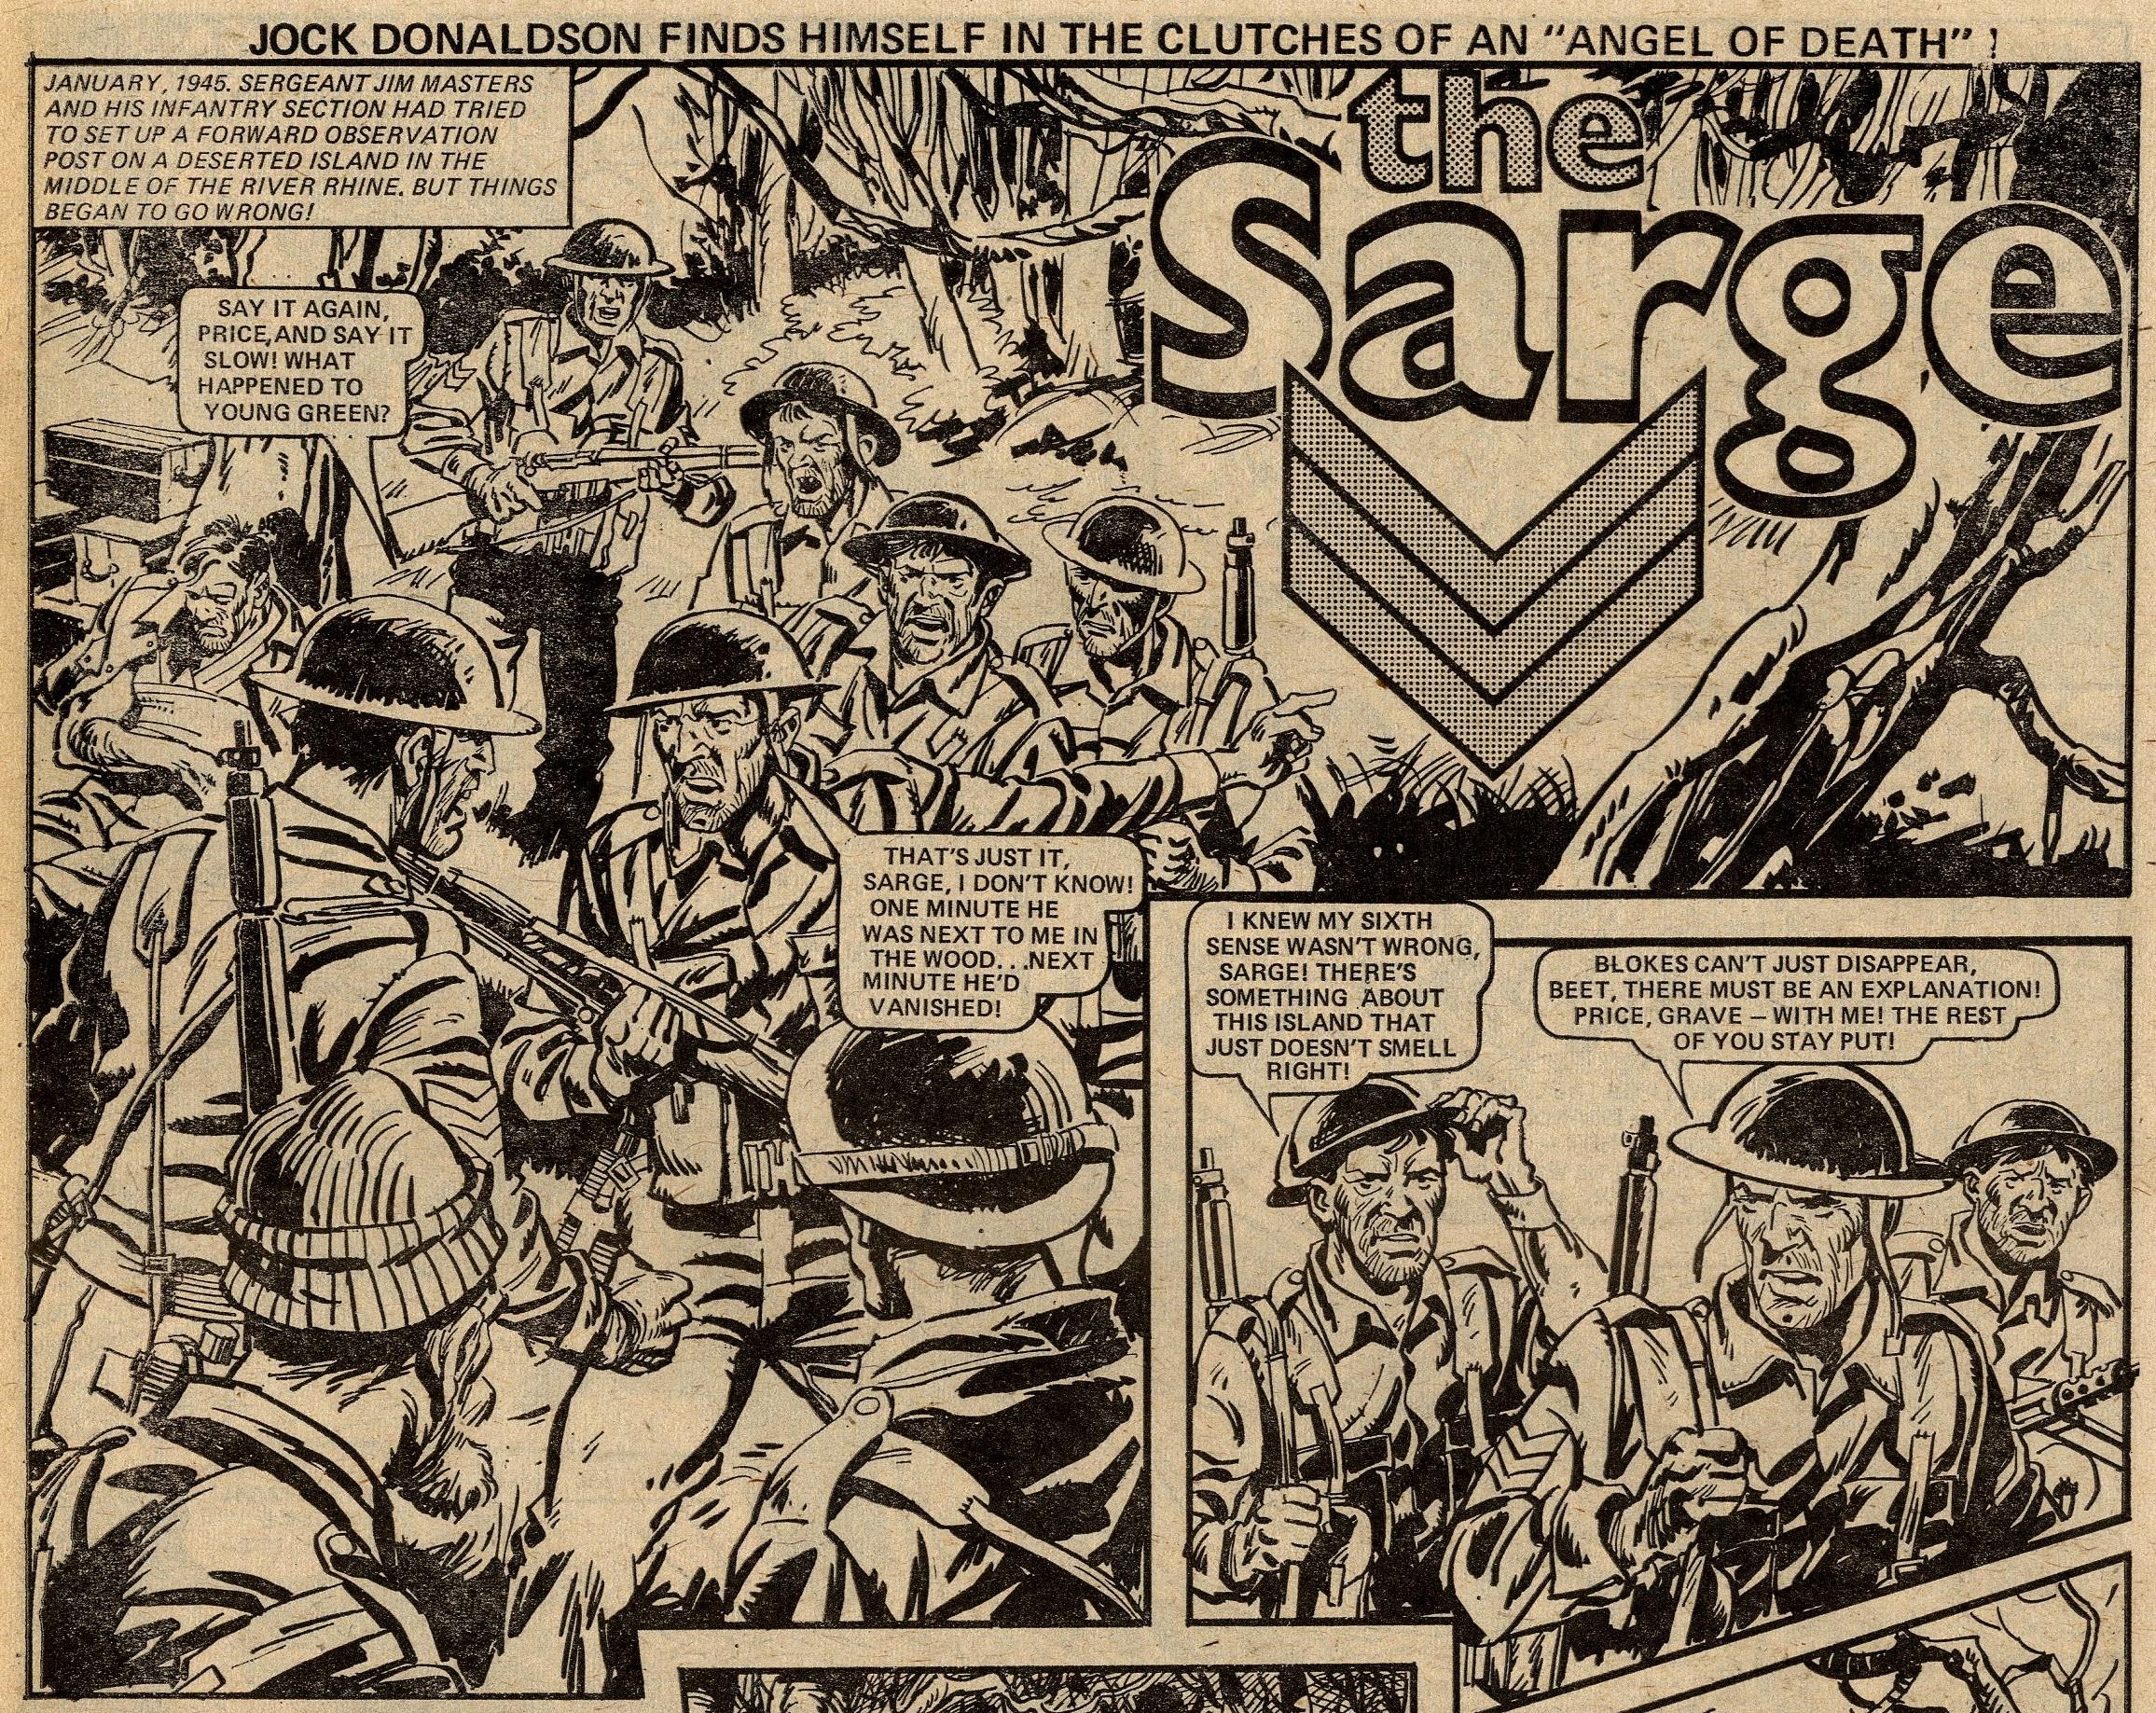 The Sarge: Scott Goodall (writer), Phil Gascoine? (artist)